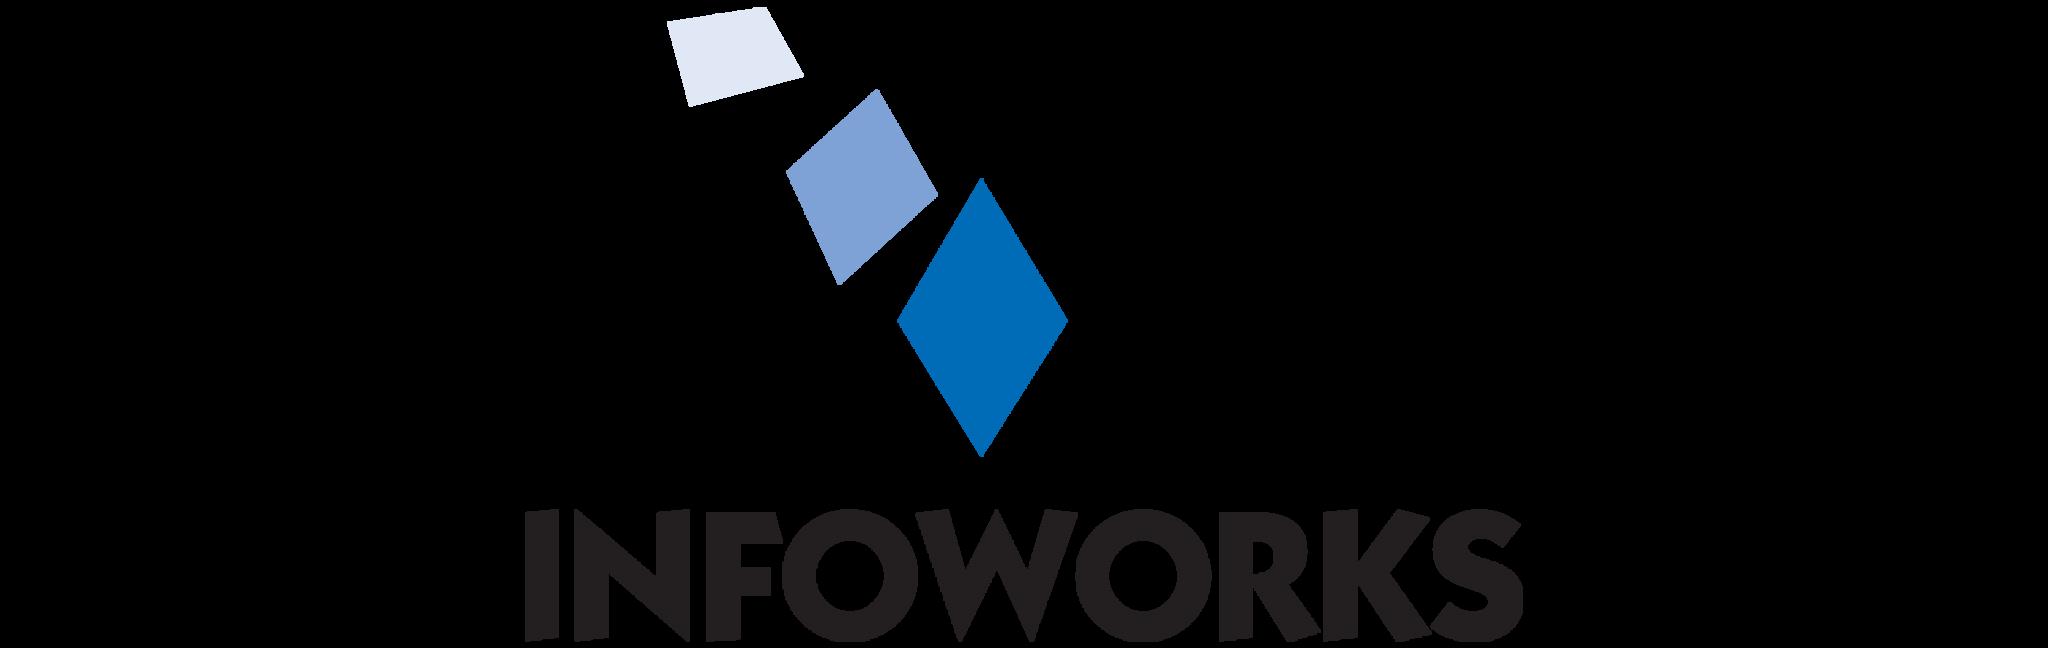 InfoWorks Automatisering bv